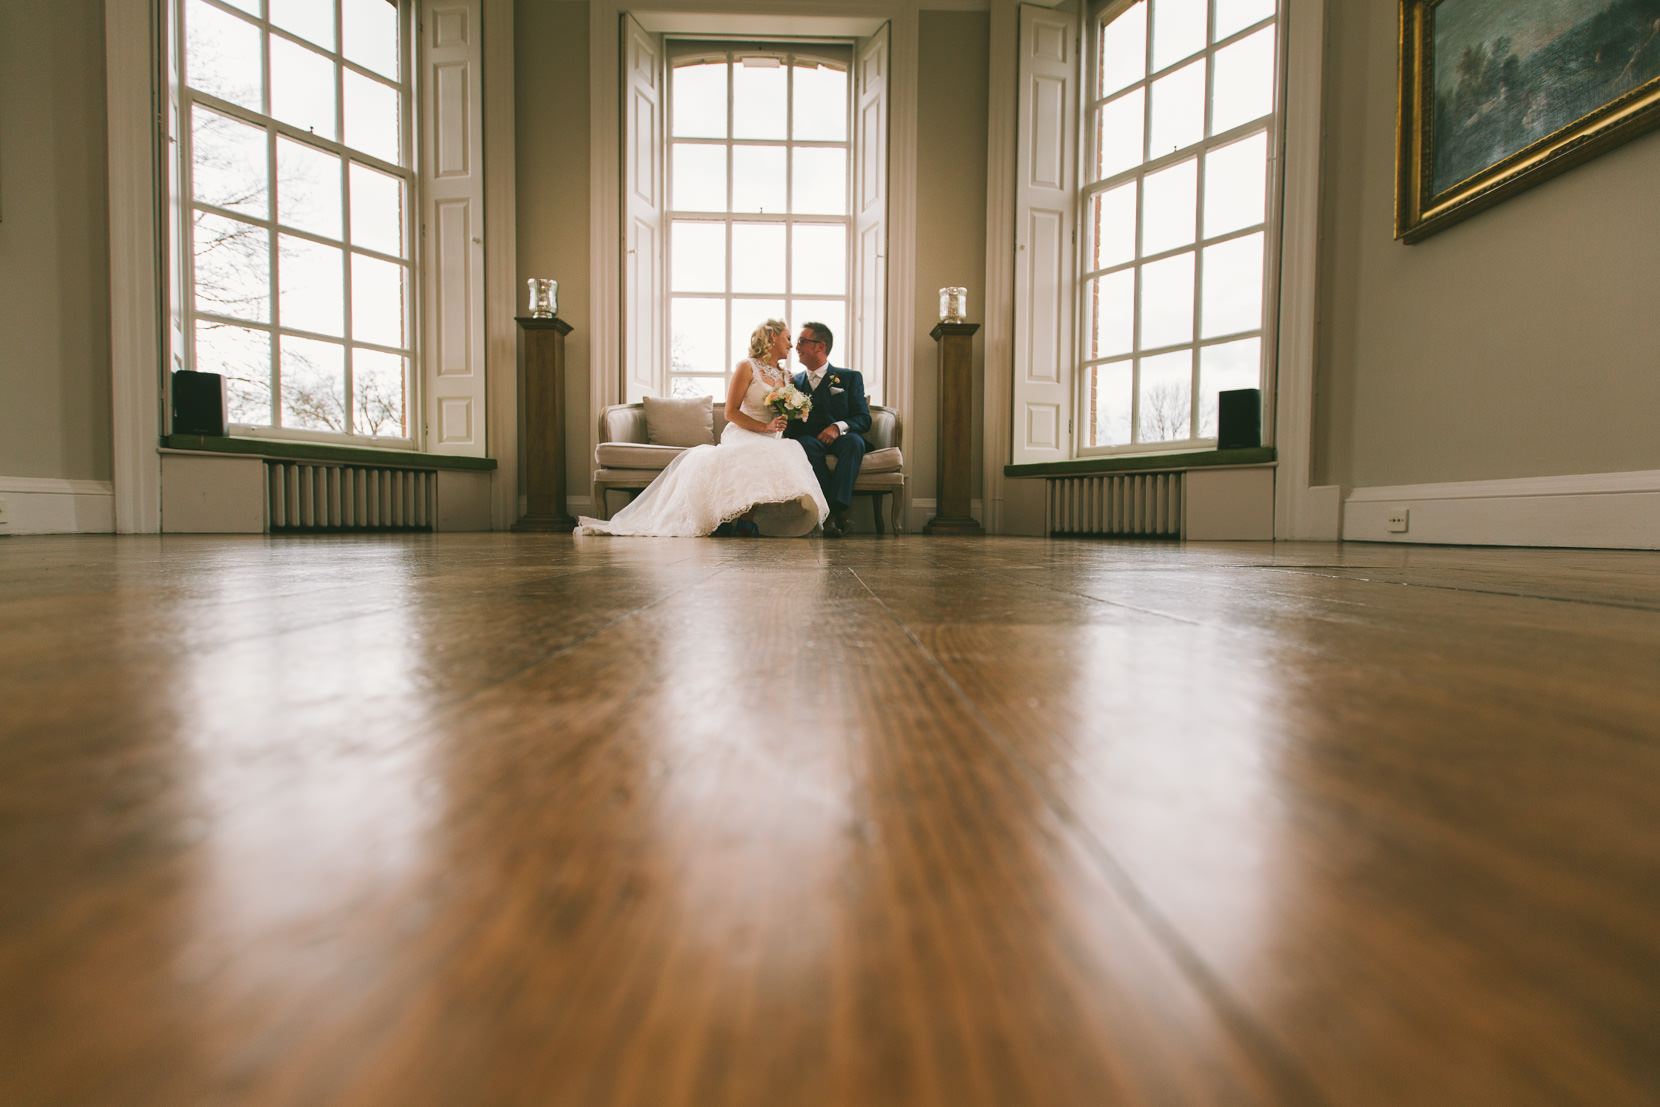 Iscoyd Park wedding photographer shropshire